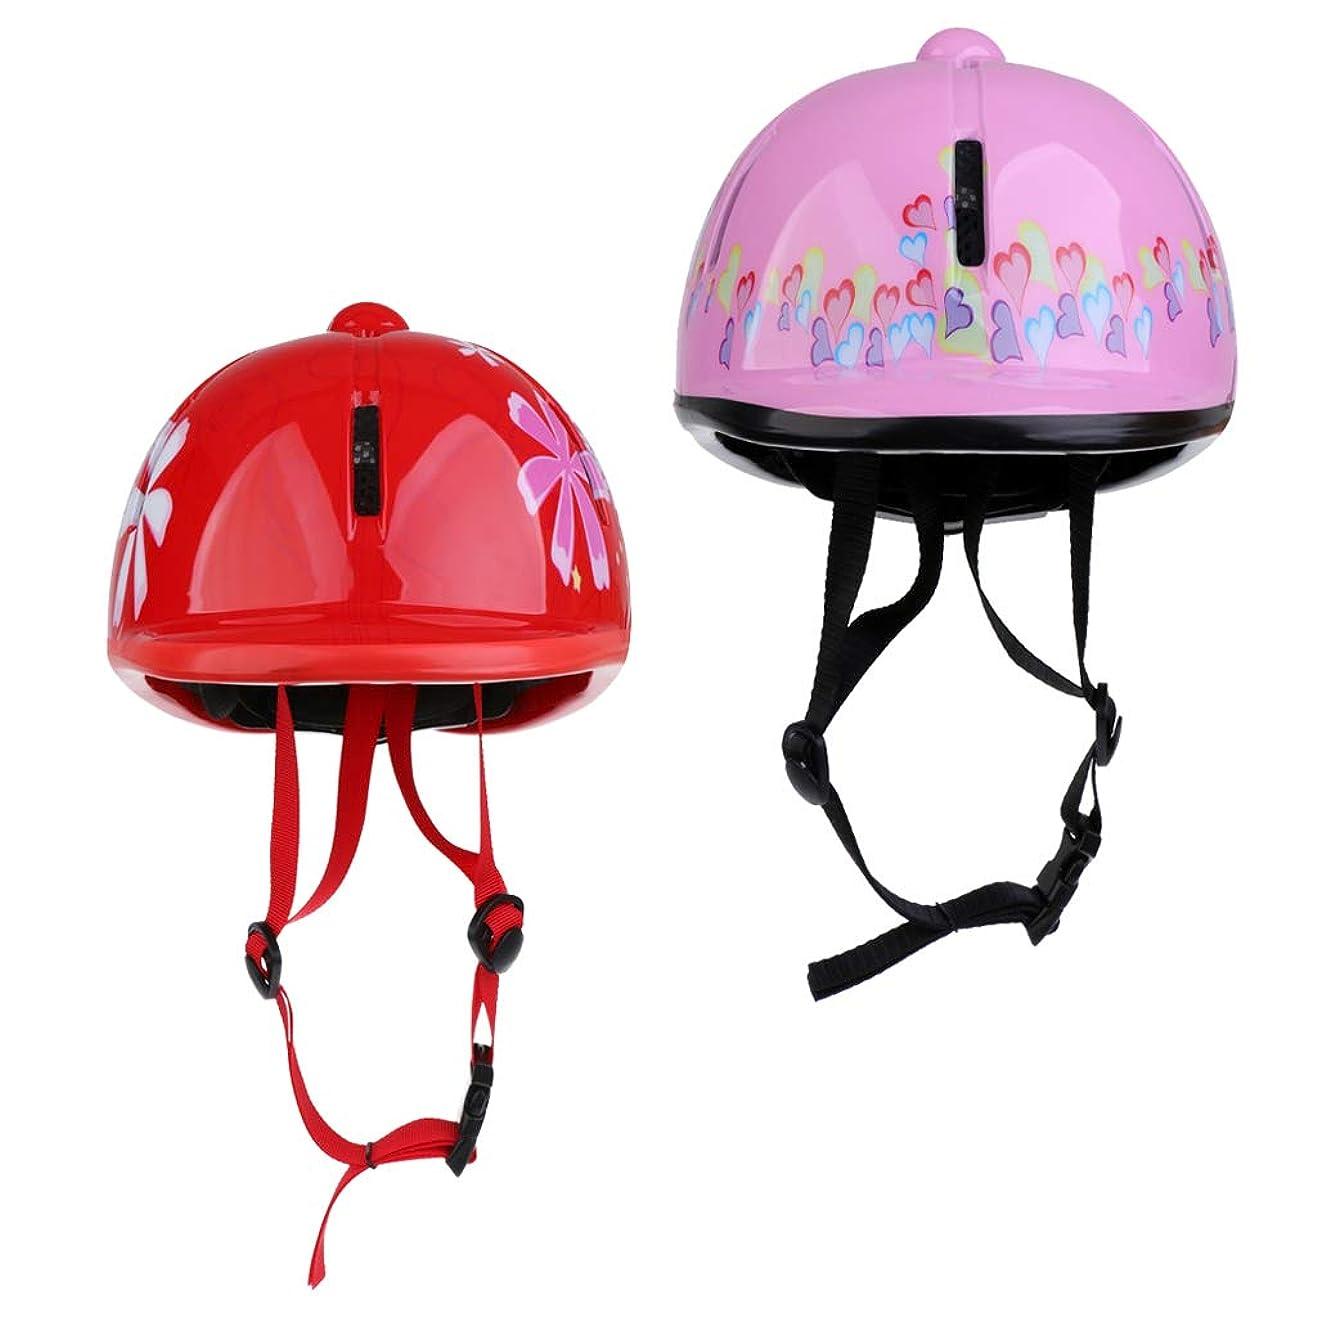 処理結論自発的gazechimp 子供用ヘルメット 安全帽子 保護具 プロテクター 調節可能 怪我防止 通気性 2個